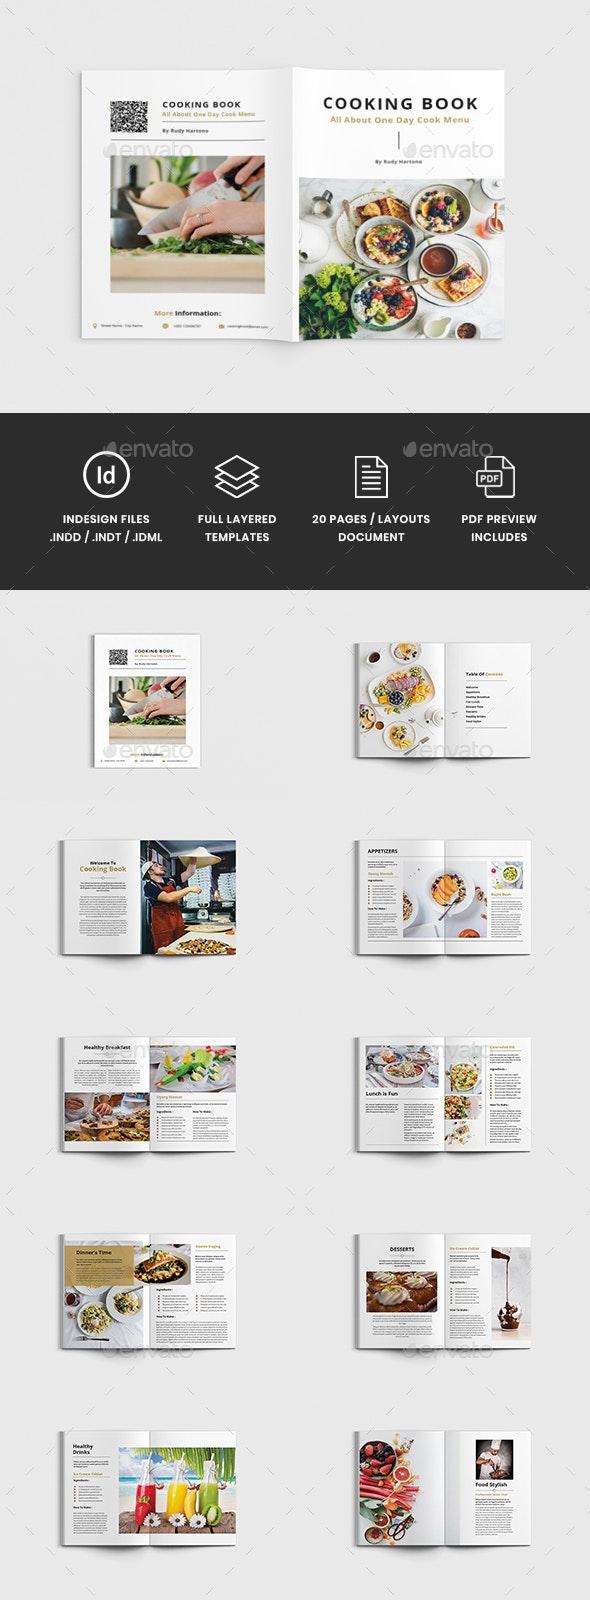 Foody - A4 Food & Cooking Book Brochure Template - Informational Brochures